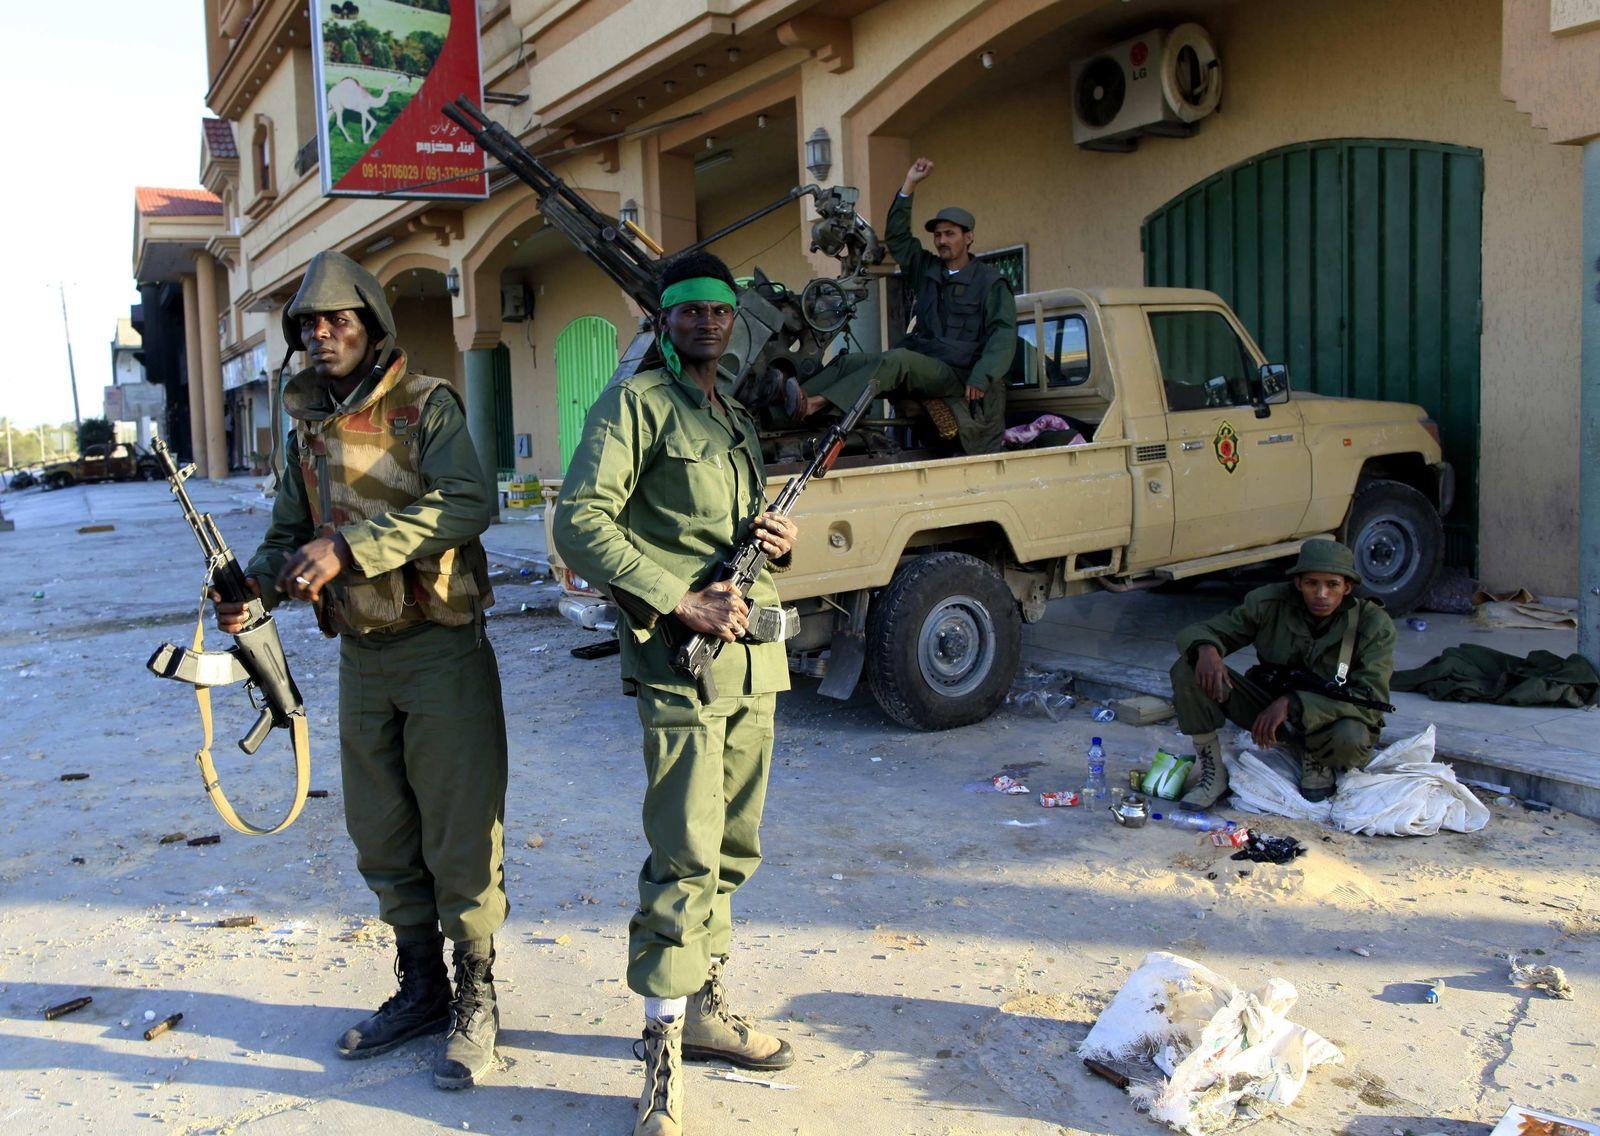 Libyen / Truppen Pro-Gaddafi